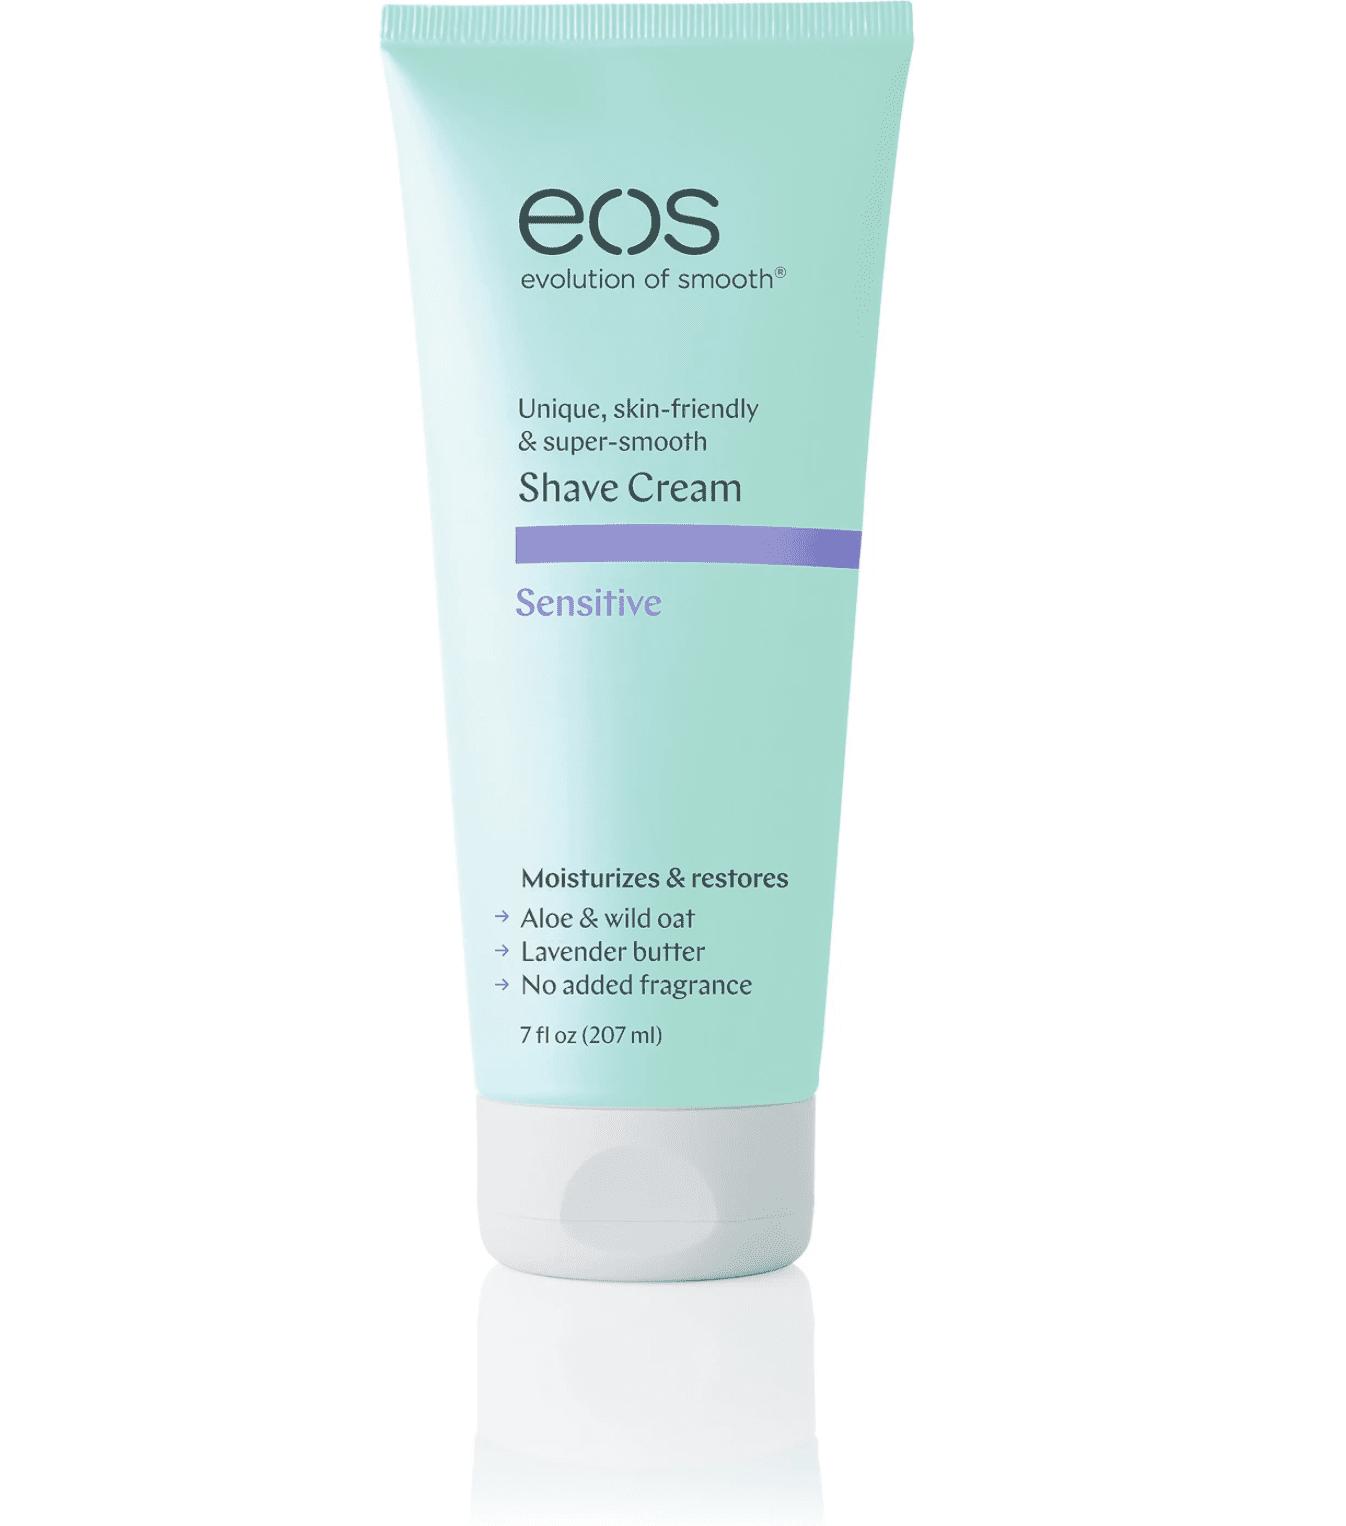 Evolution of Smooth sensitive shave cream